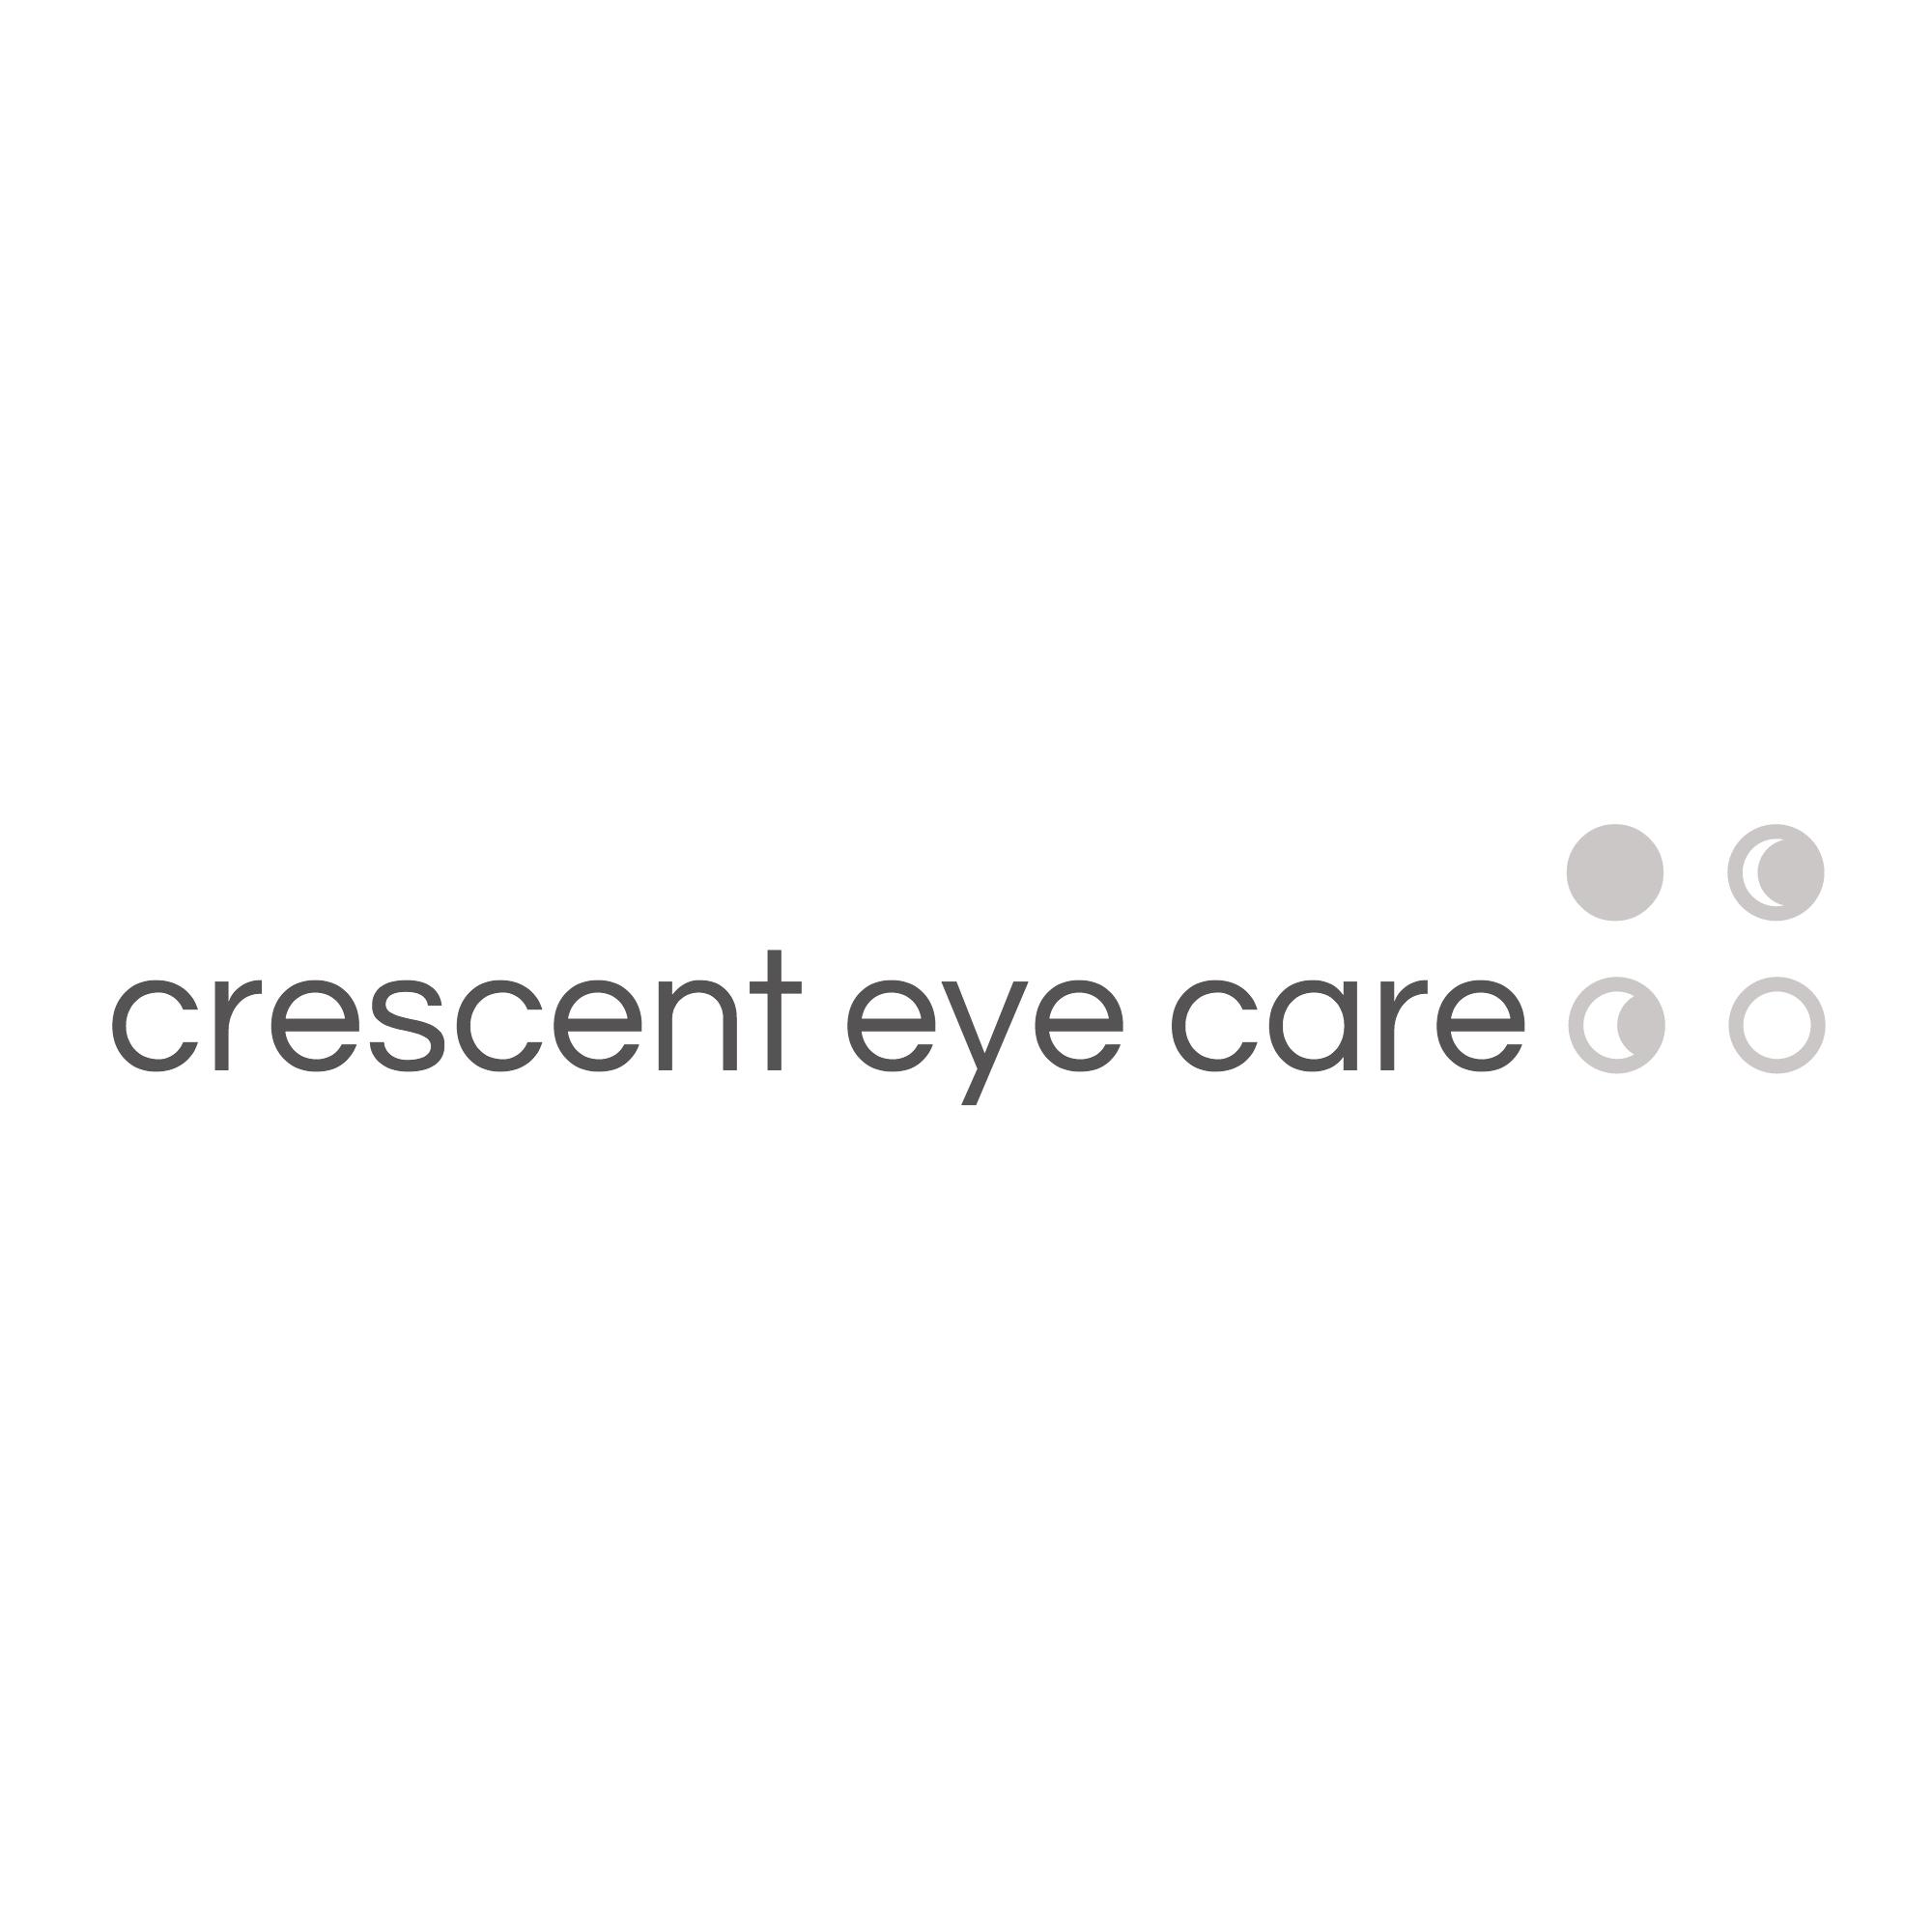 Crescent Eye Care